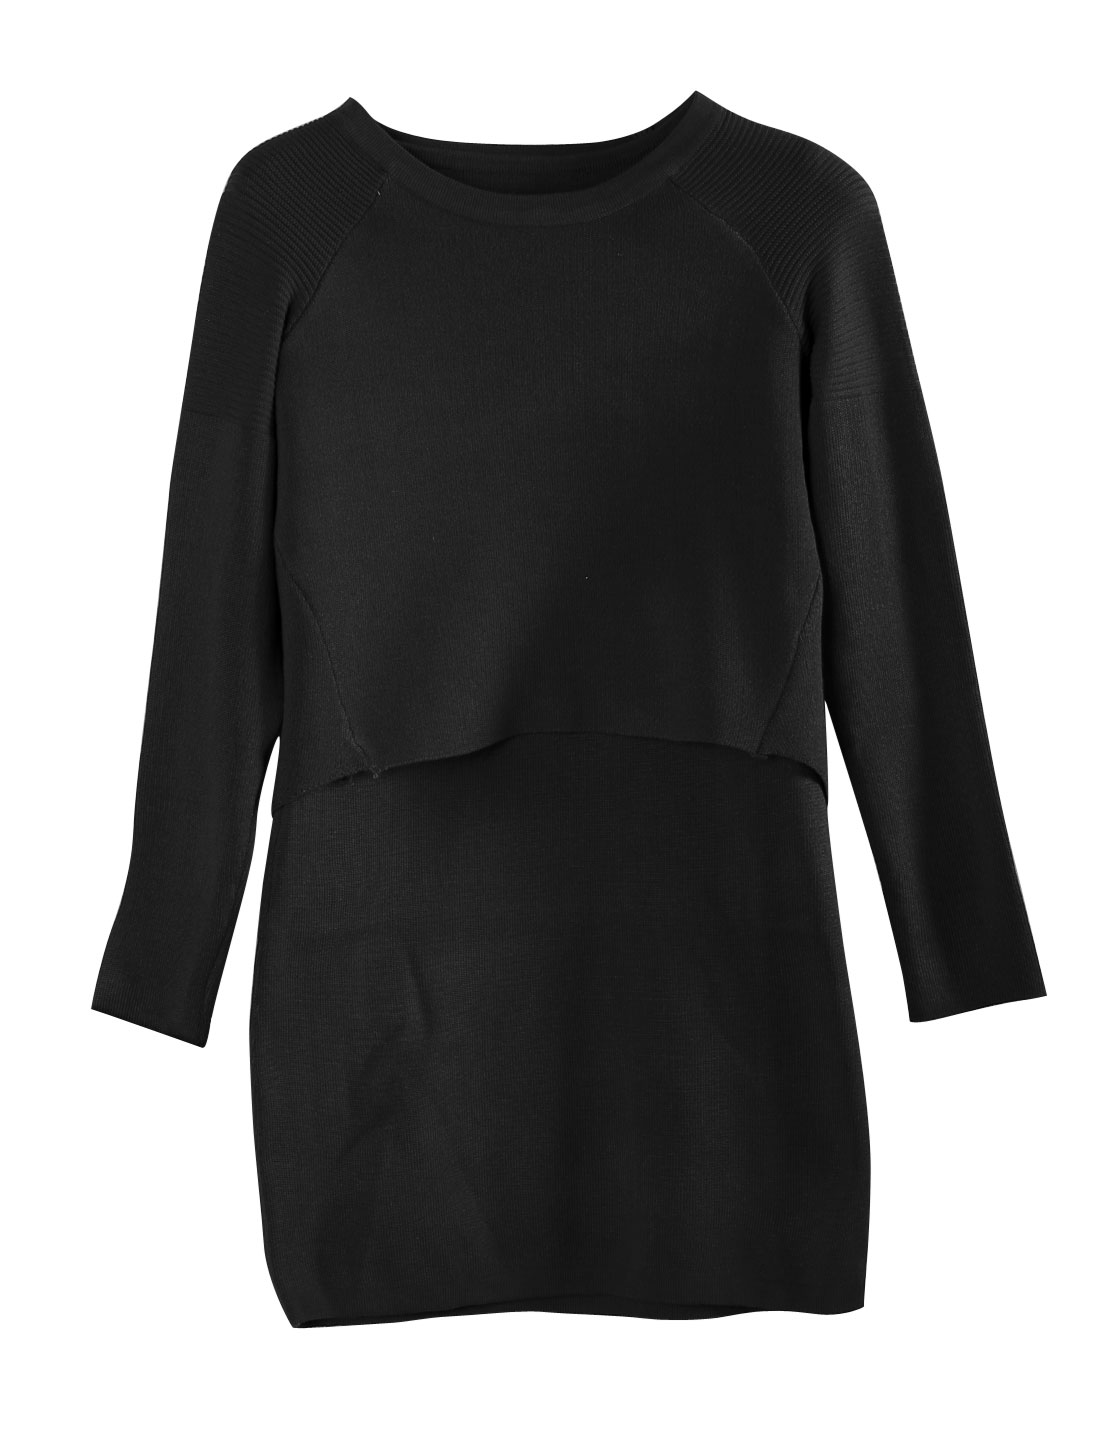 Round Neck Knitted Tops w Sleeveless Black Dress for Women Black S